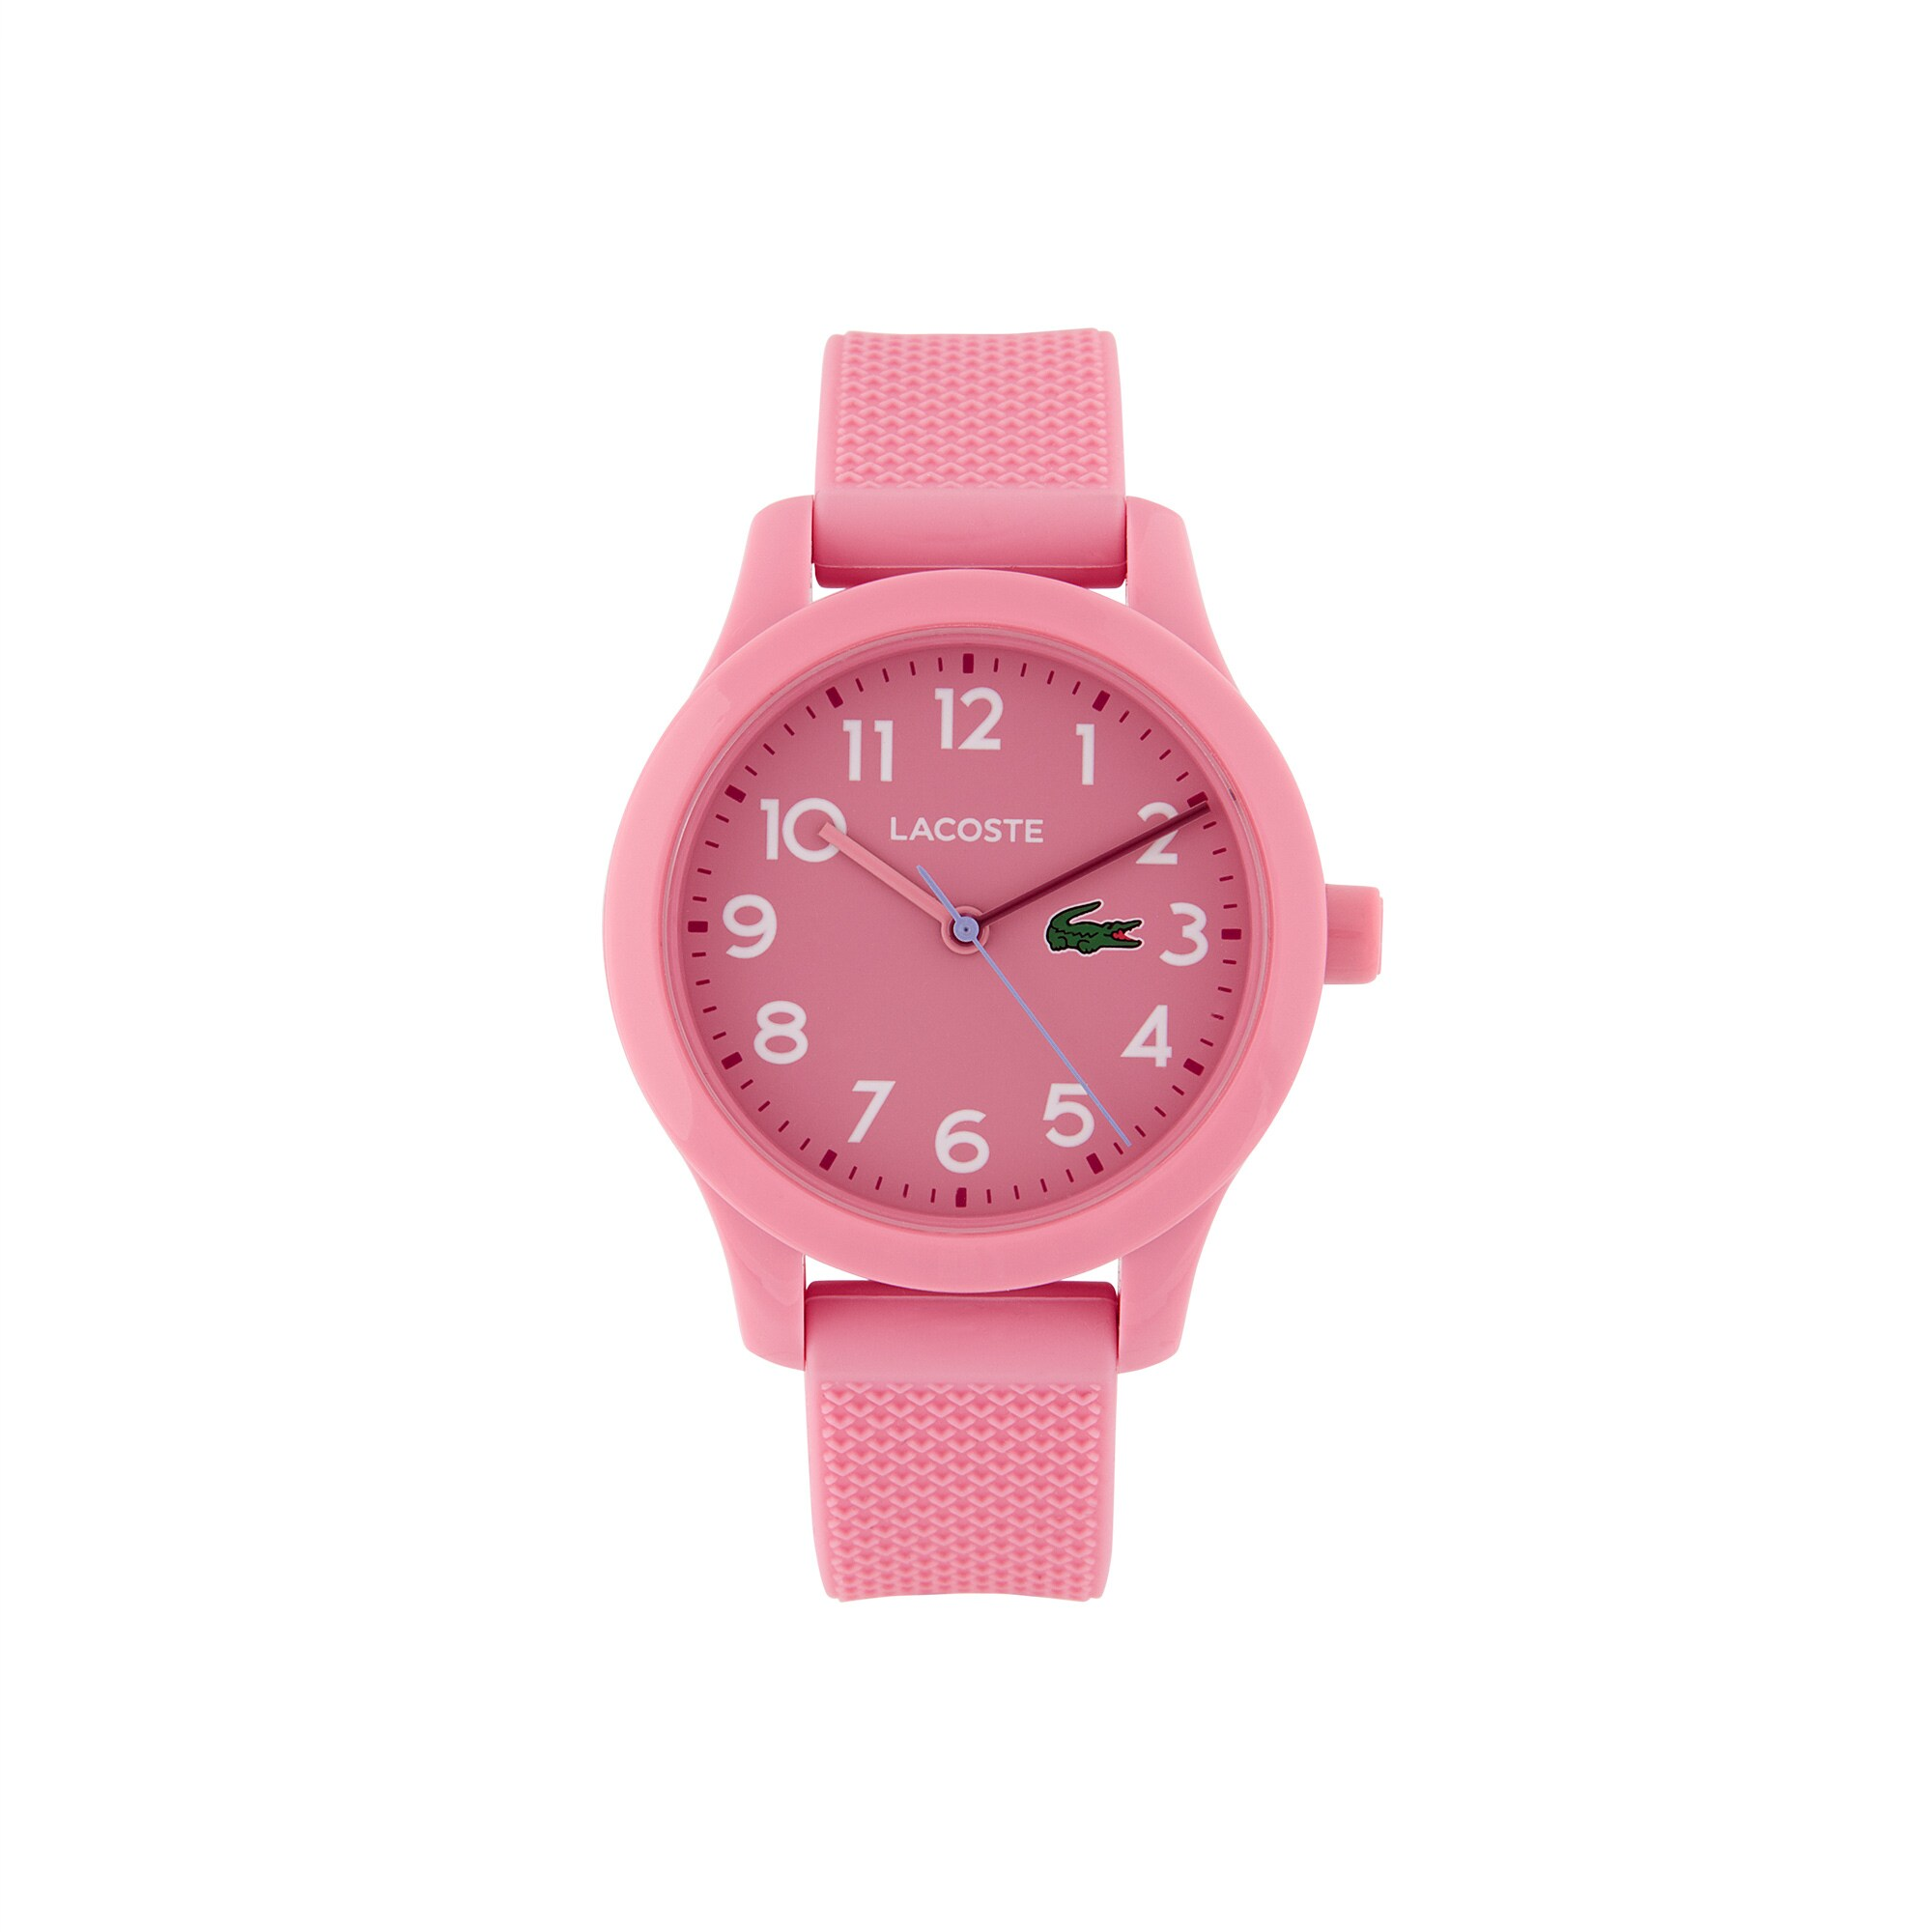 Reloj Lacoste.12.12 Kids Rosa